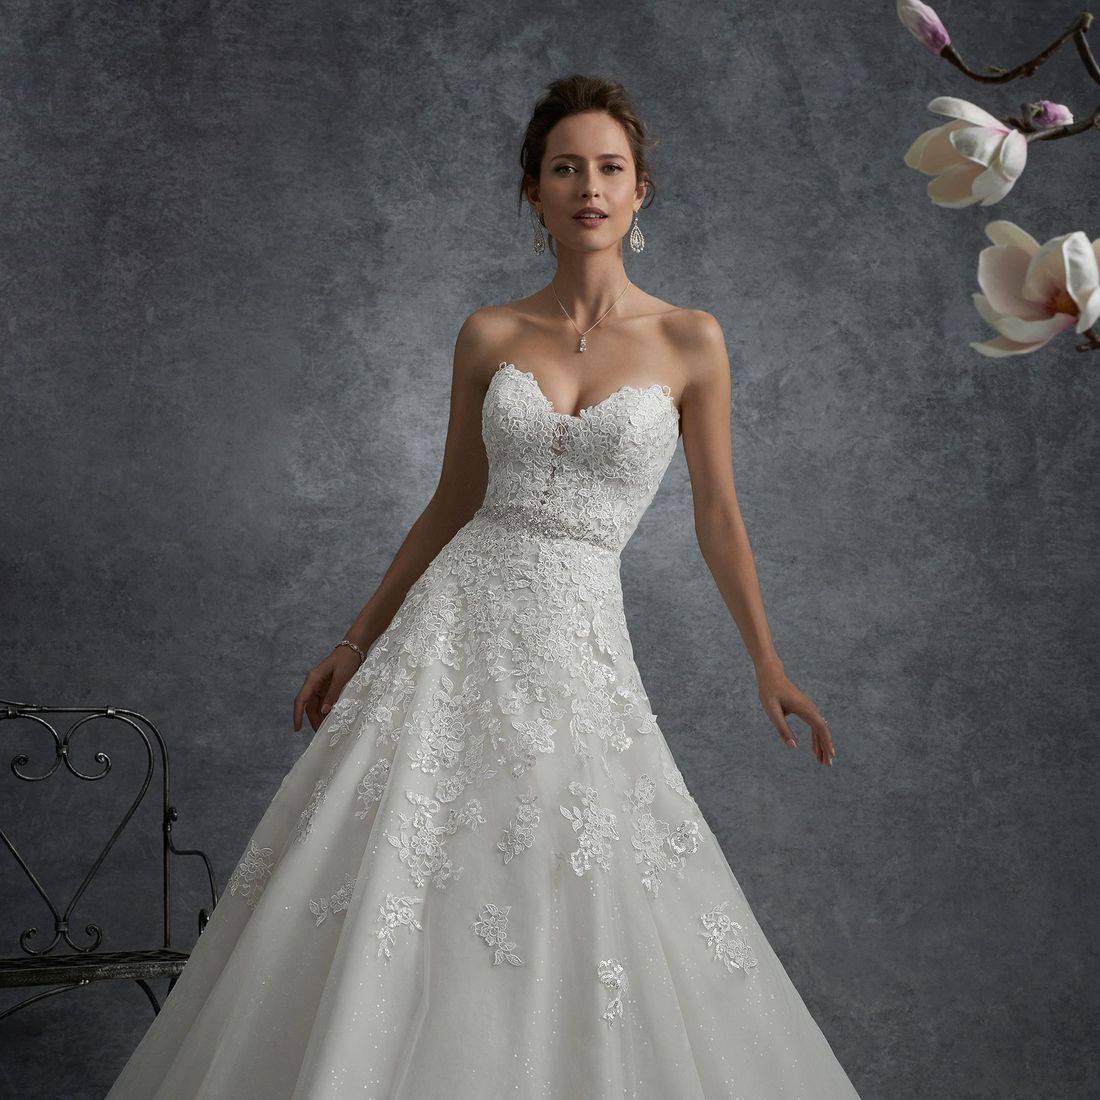 aline wedding dress, big wedding dress, princess wedding dress, sparkly wedding dress, wedding dress with chapel train, sweetheart neckline wedding dress, lace up back wedding dress